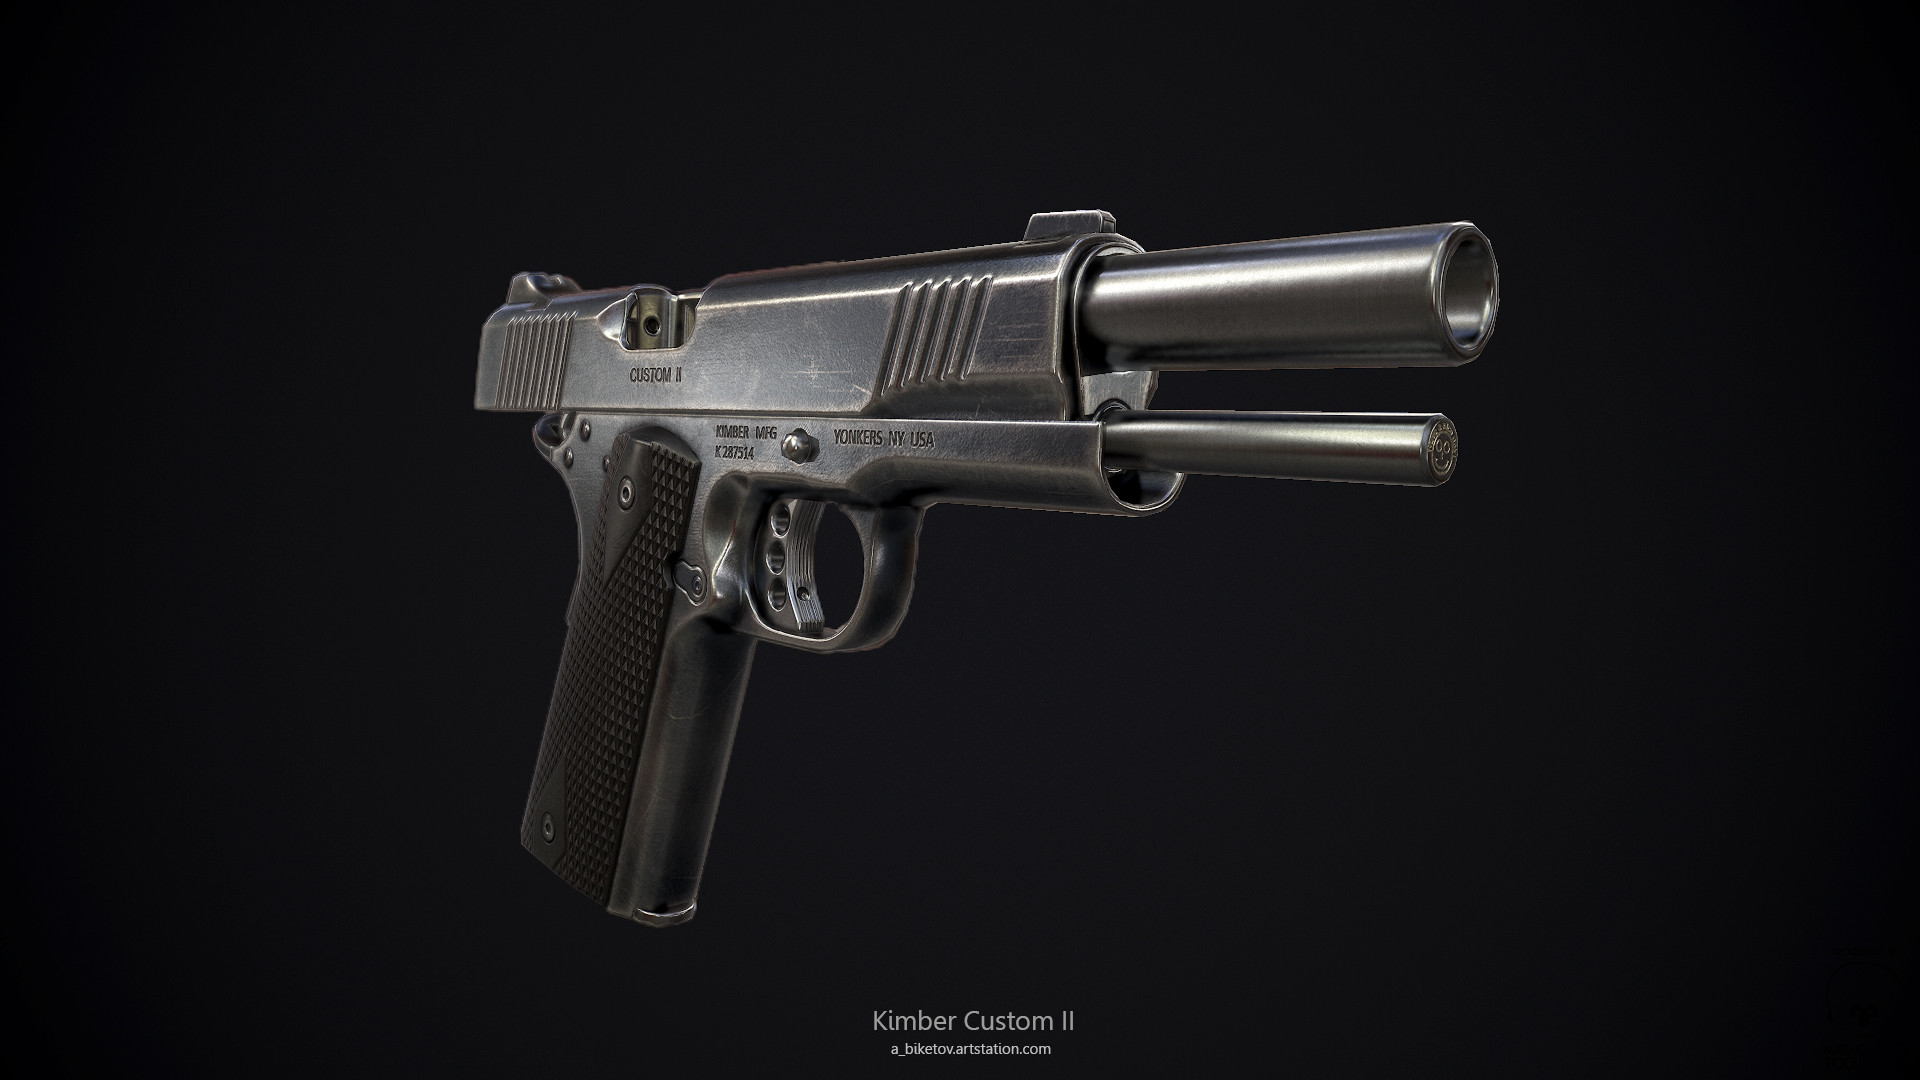 ArtStation - Kimber Custom II  45 ACP 1911, Aleksandr Biketov